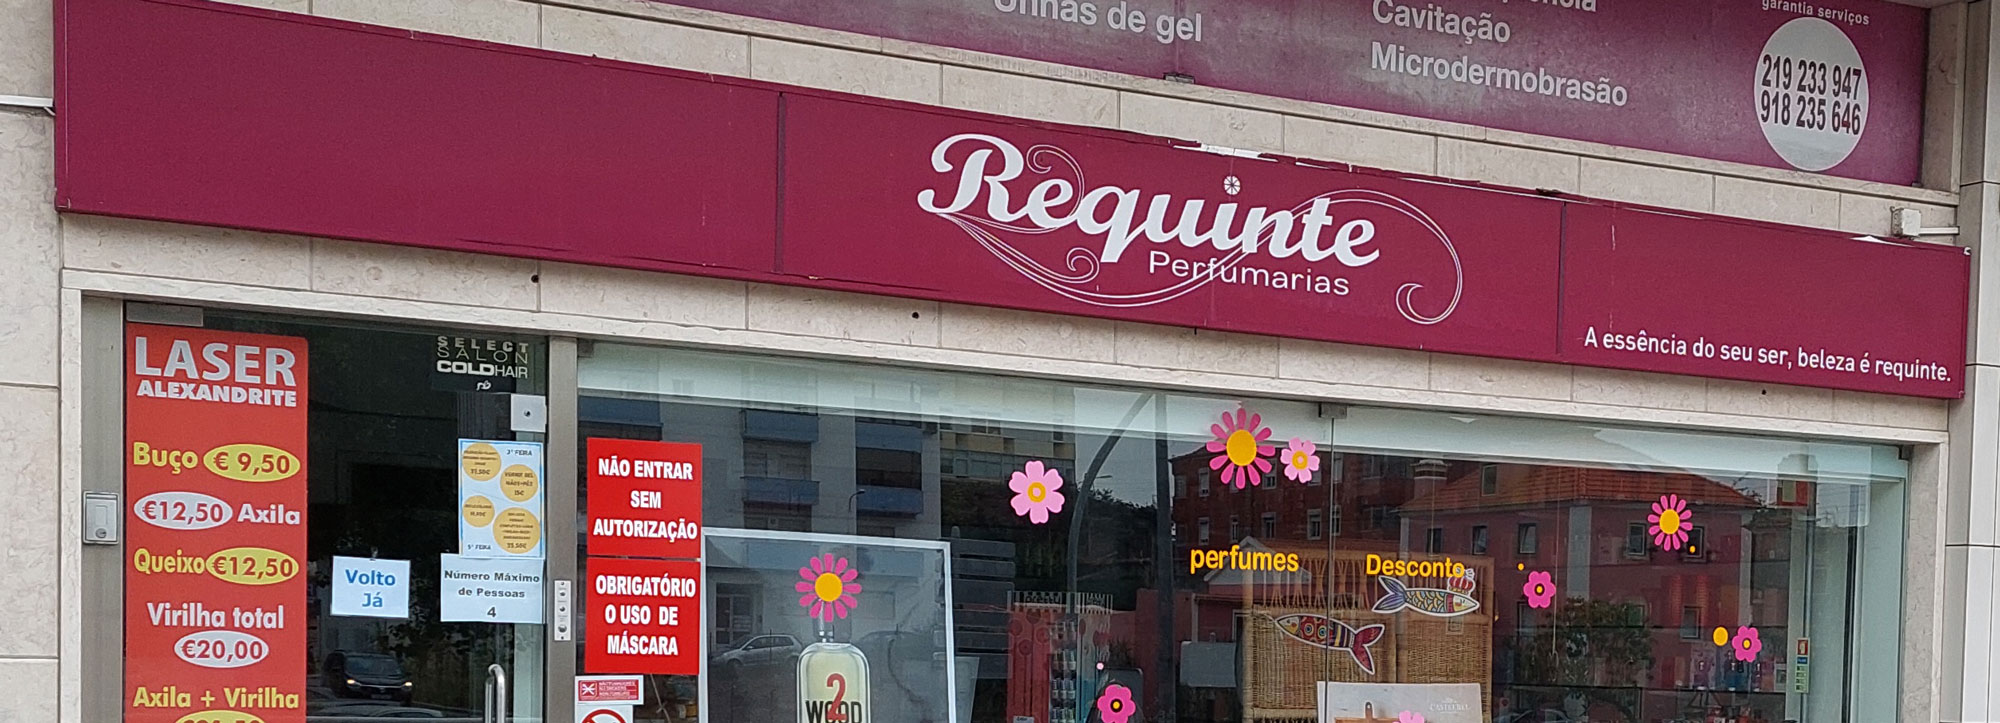 Requinte Perfumarias banner